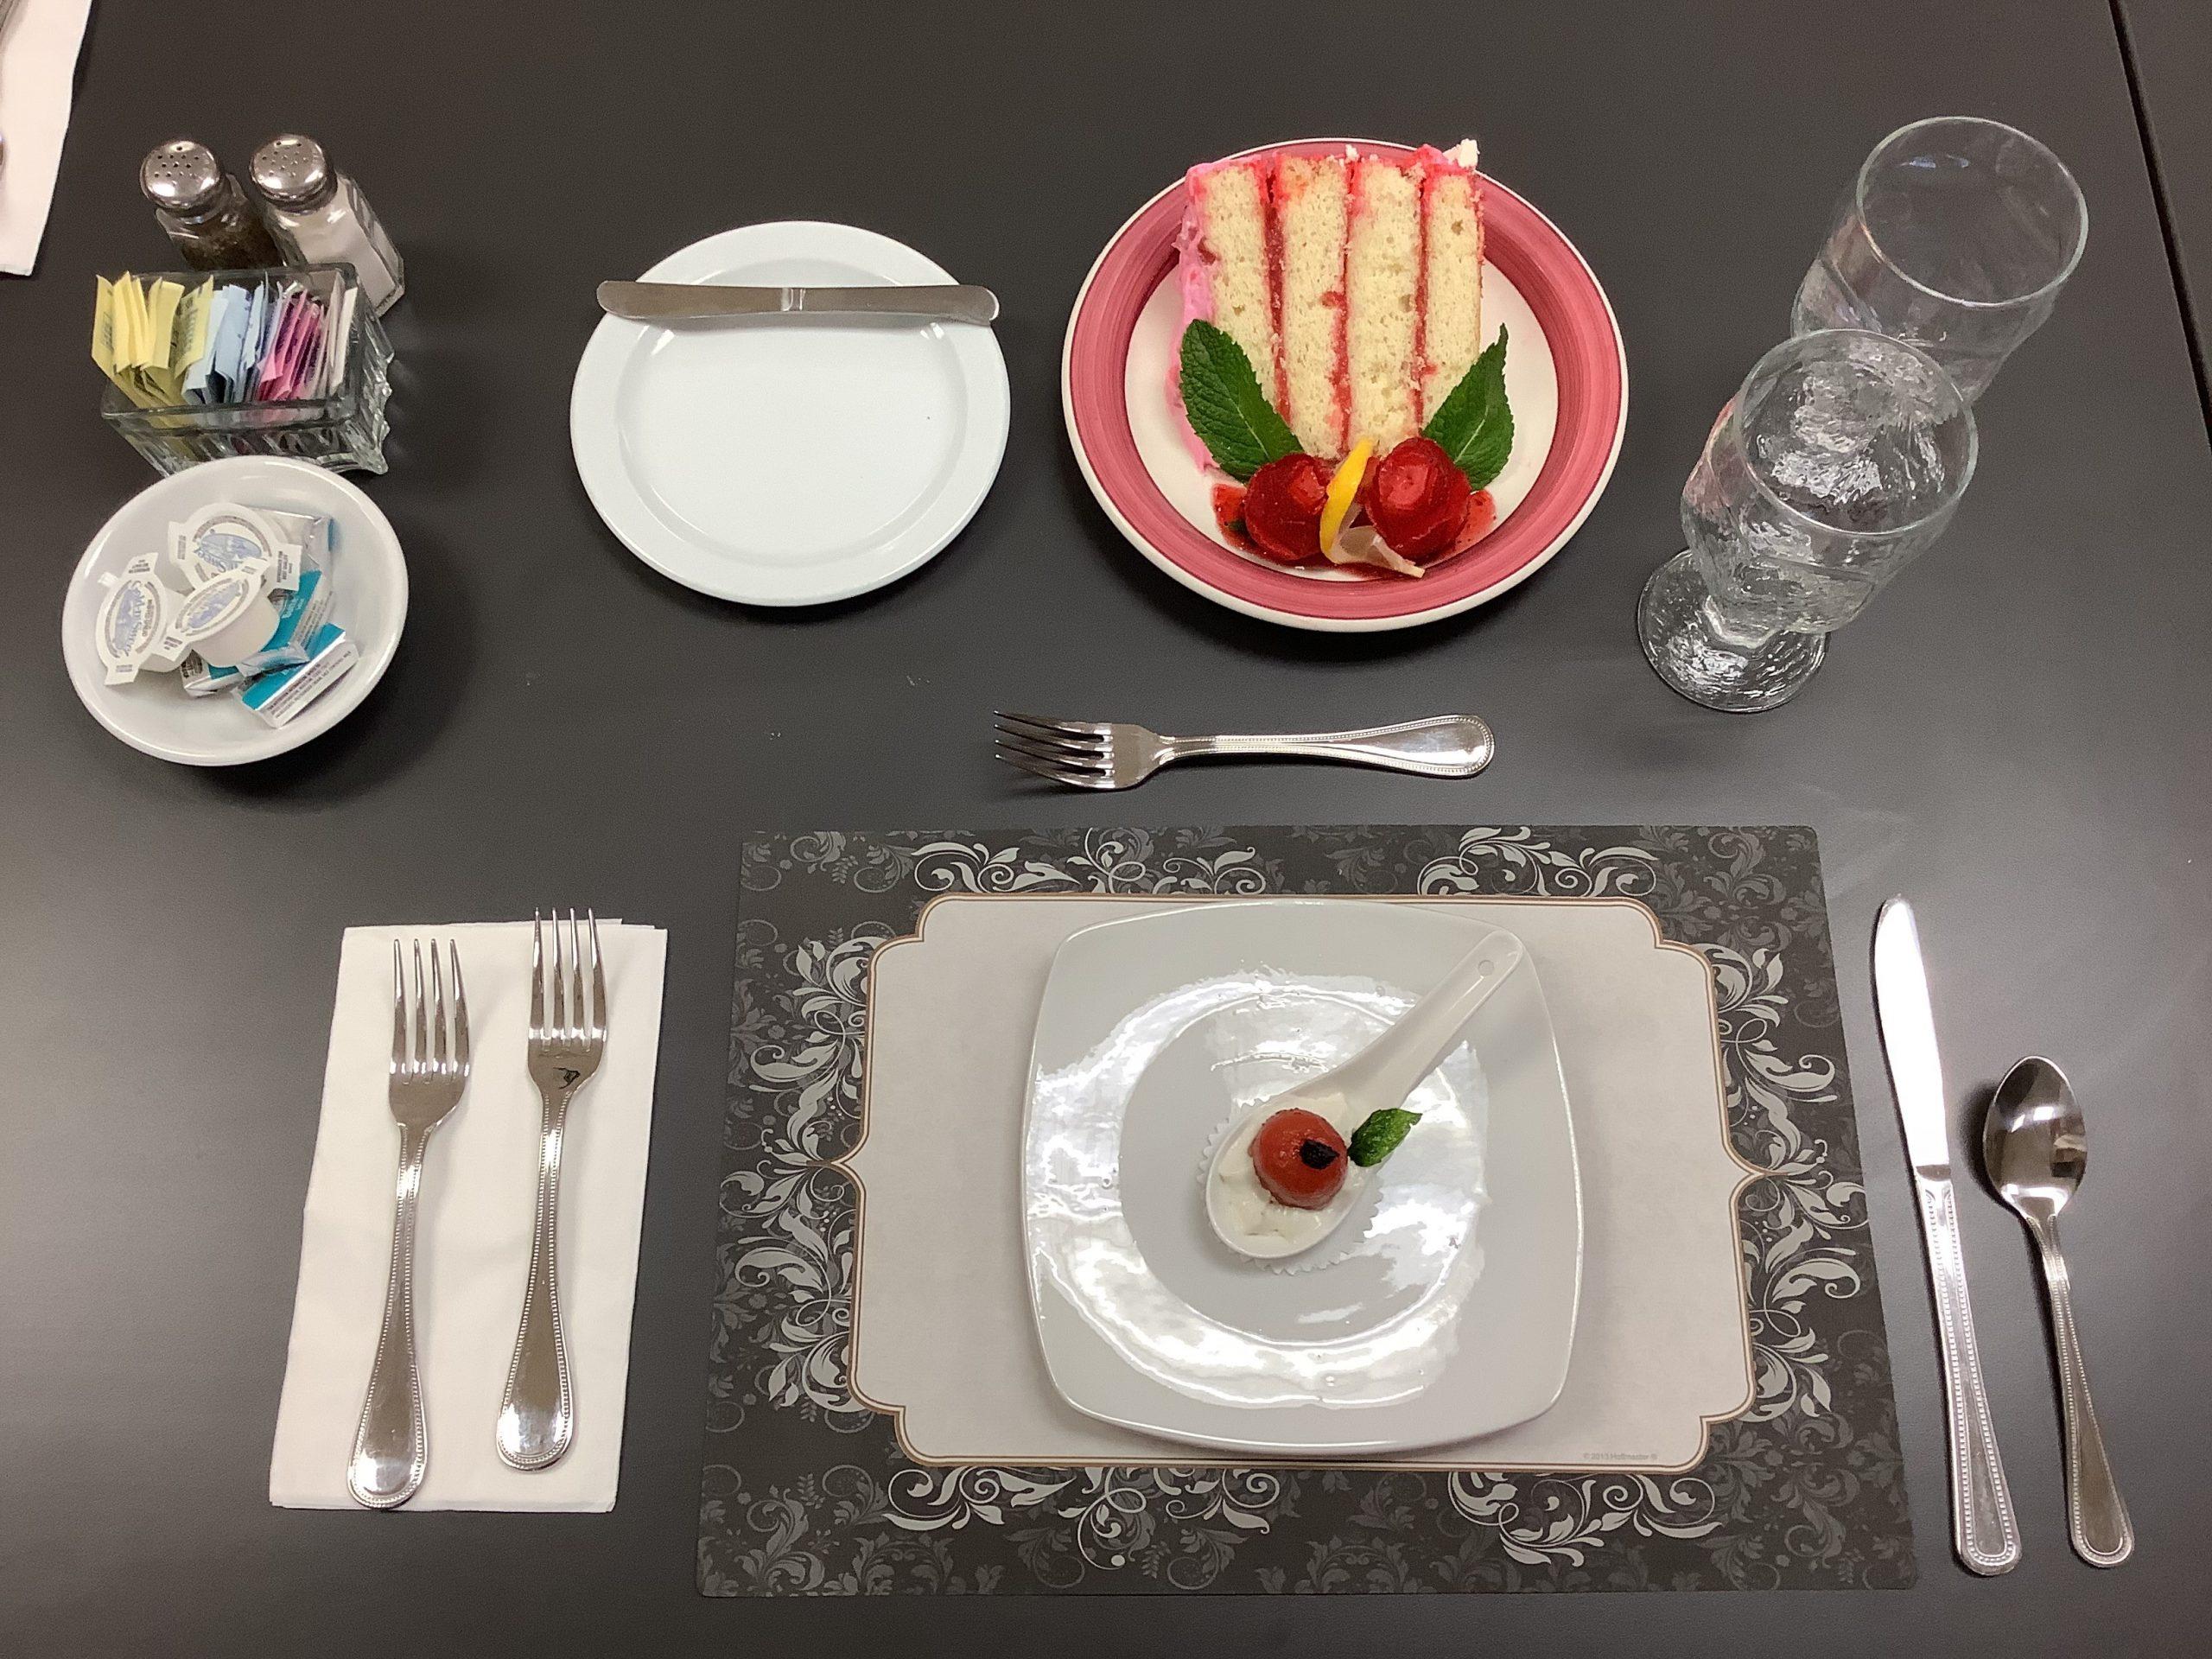 Culinary2 5 091521 scaled Academic Affairs ~ 09/15/21